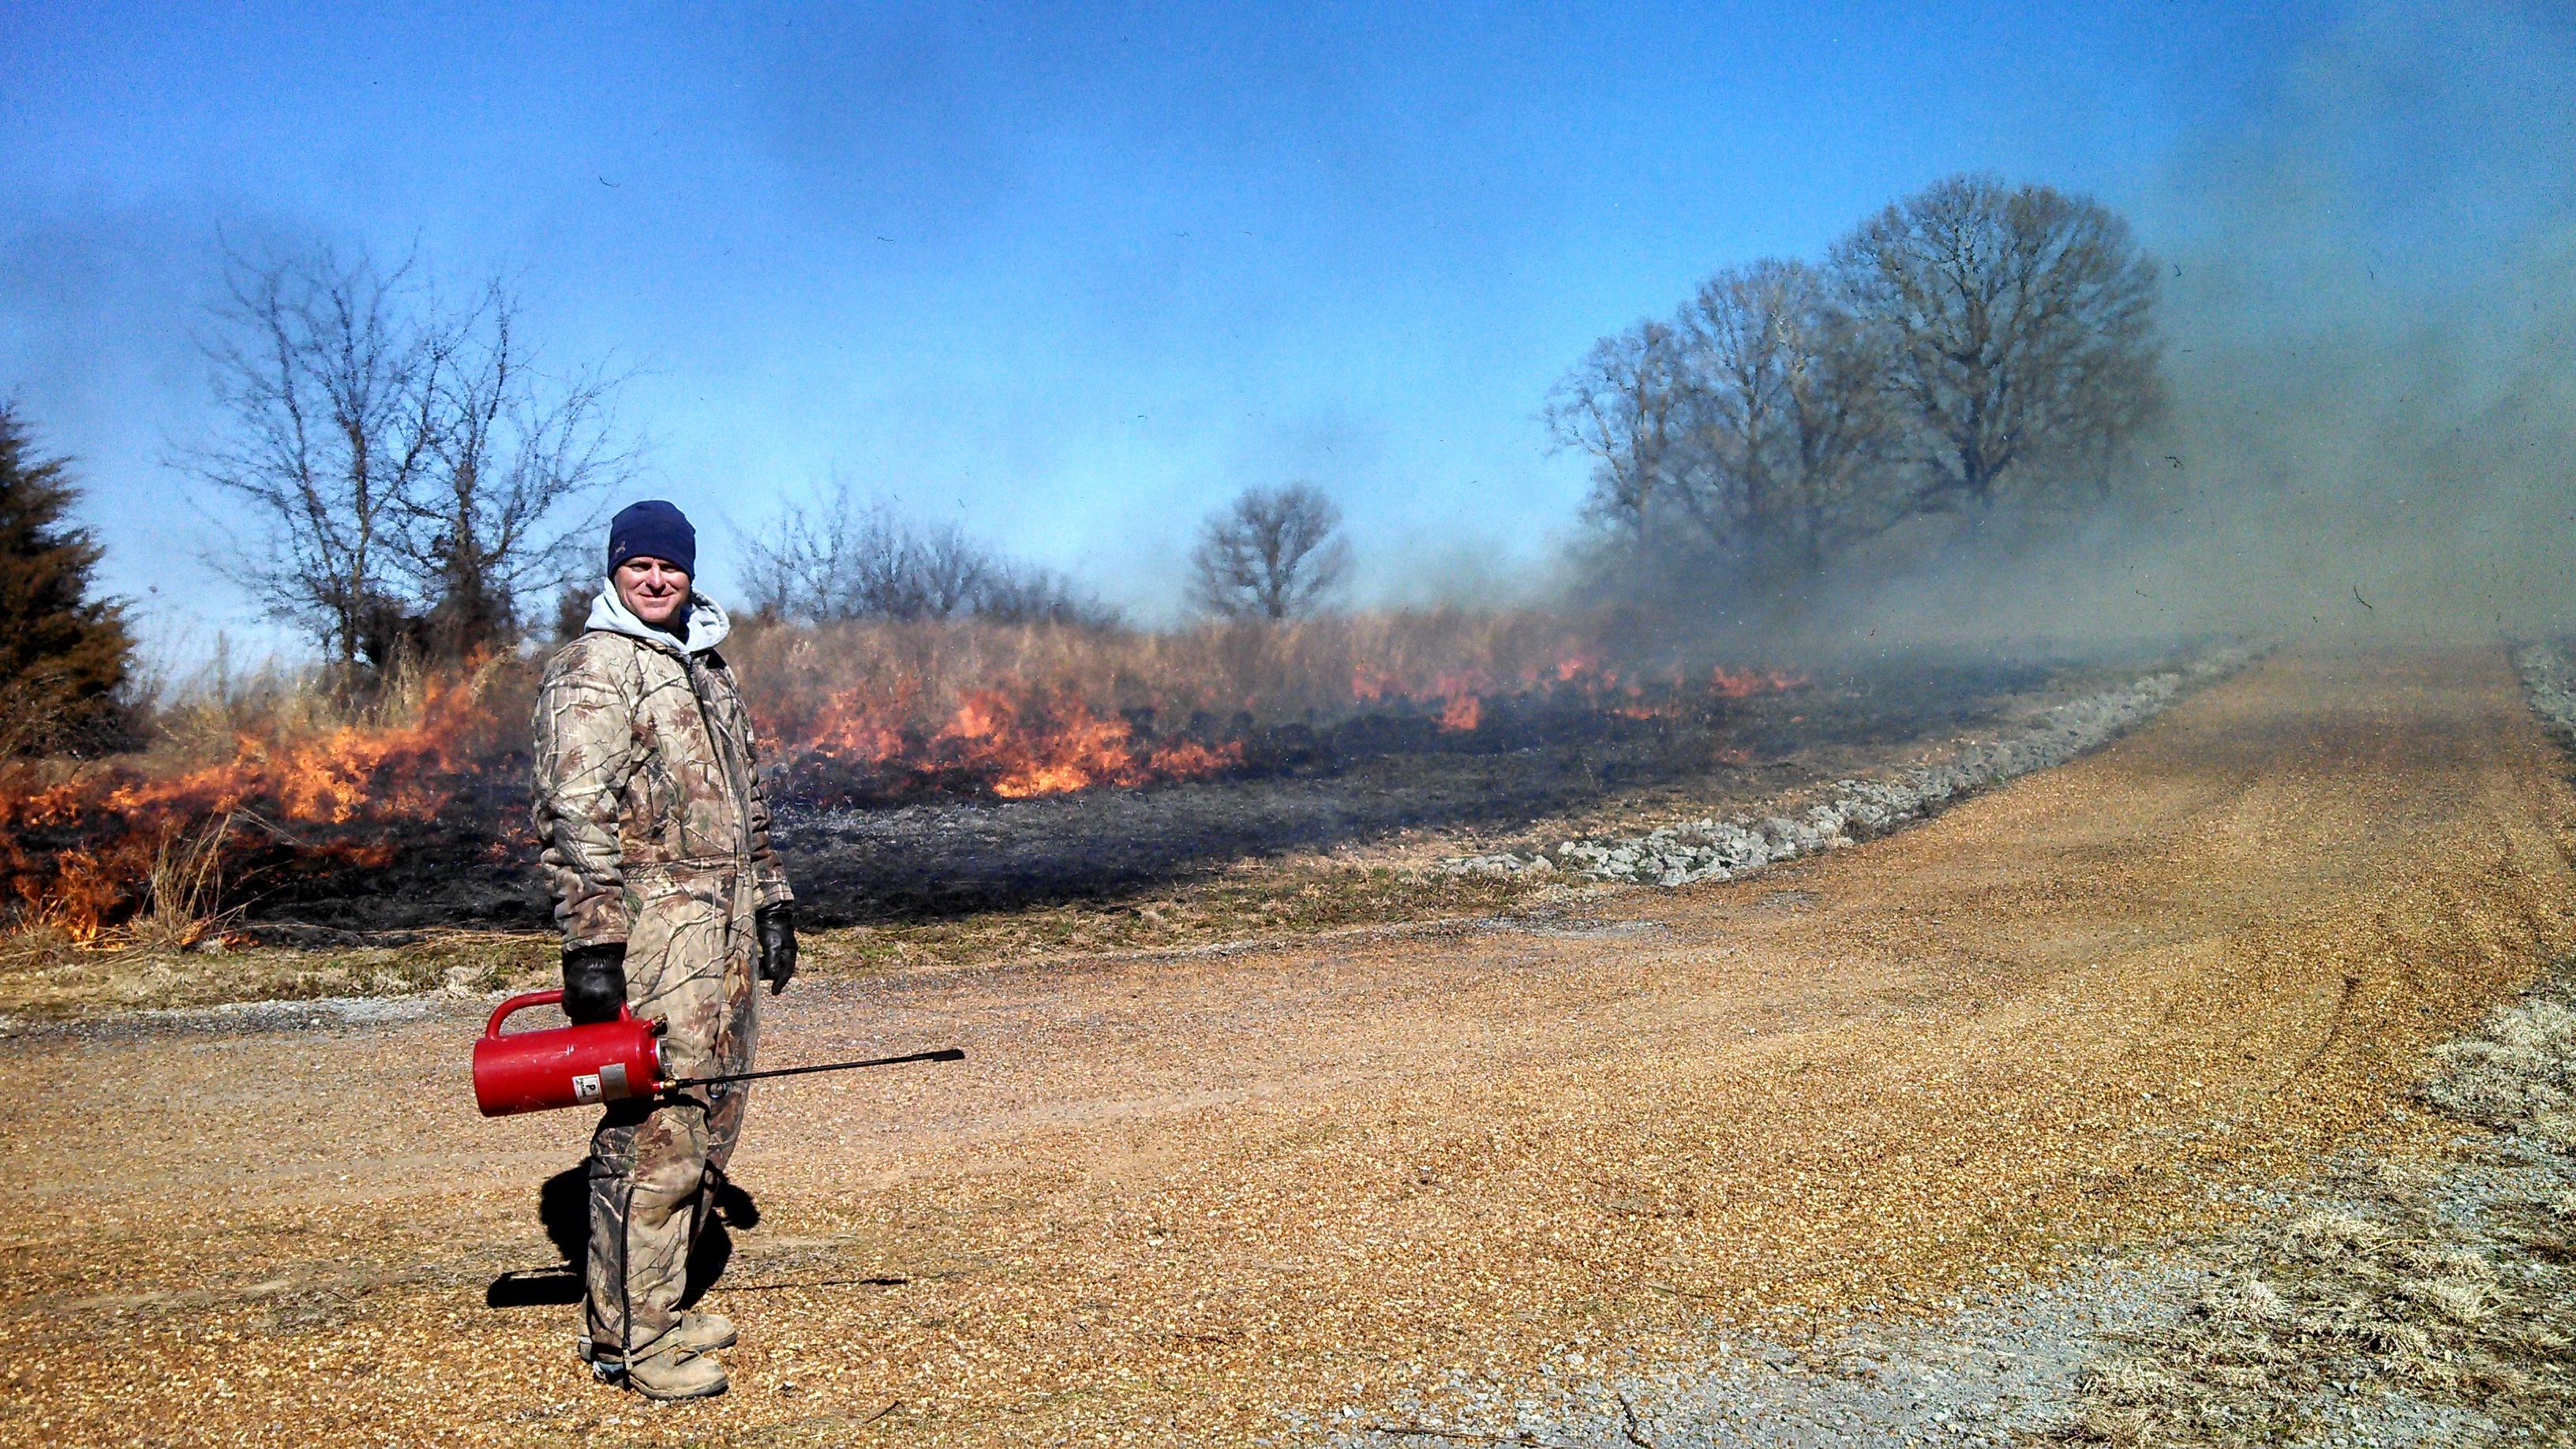 NRCS DC, Cory Hodge in Bedford County monitors Prescribed Burn